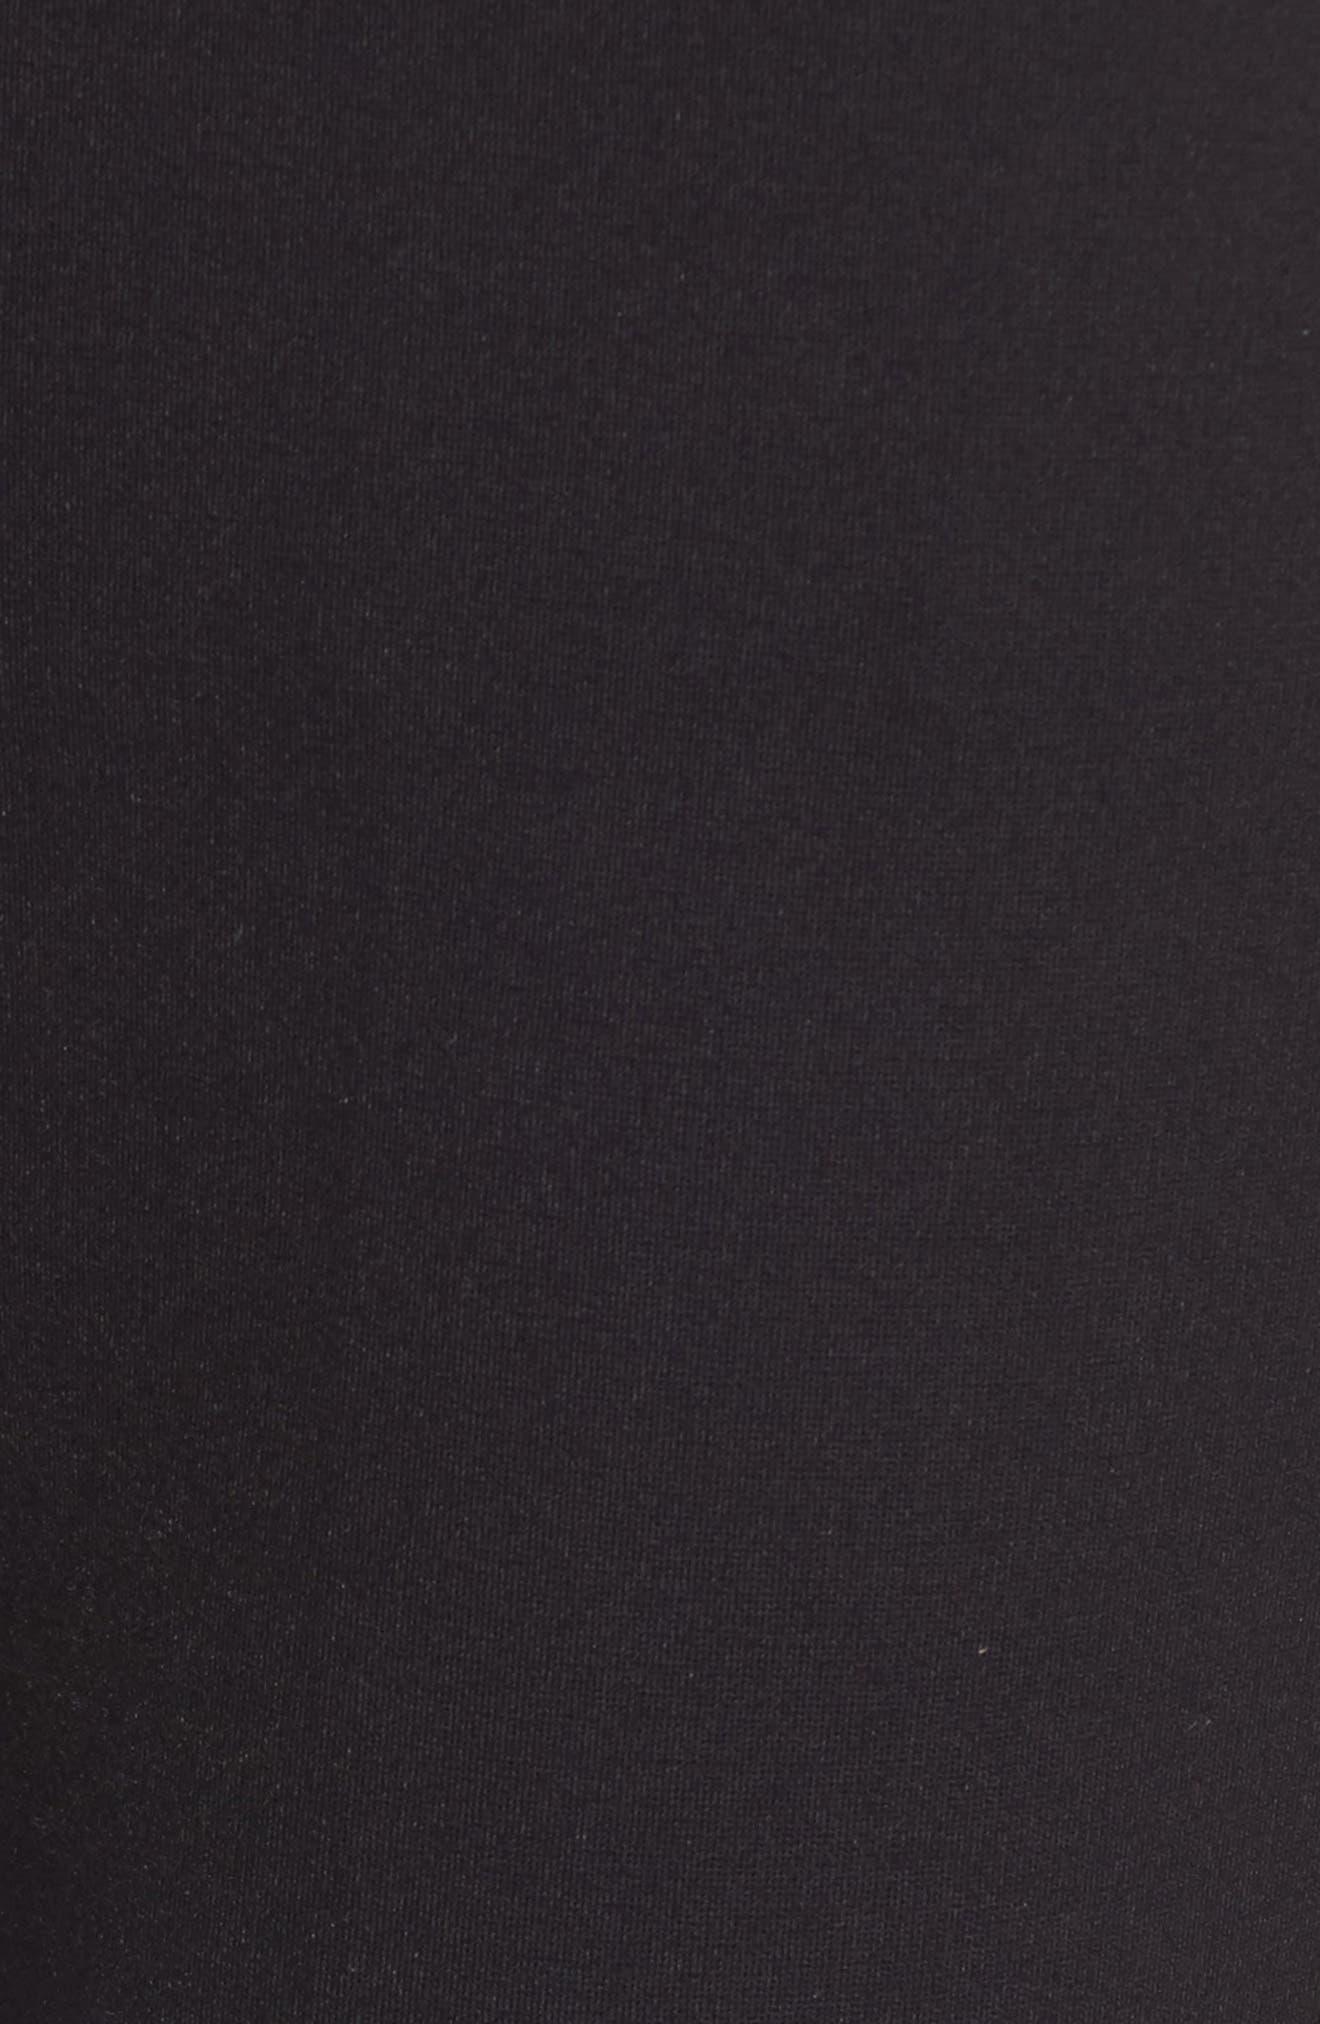 Stretch Knit Trousers,                             Alternate thumbnail 5, color,                             BLACK